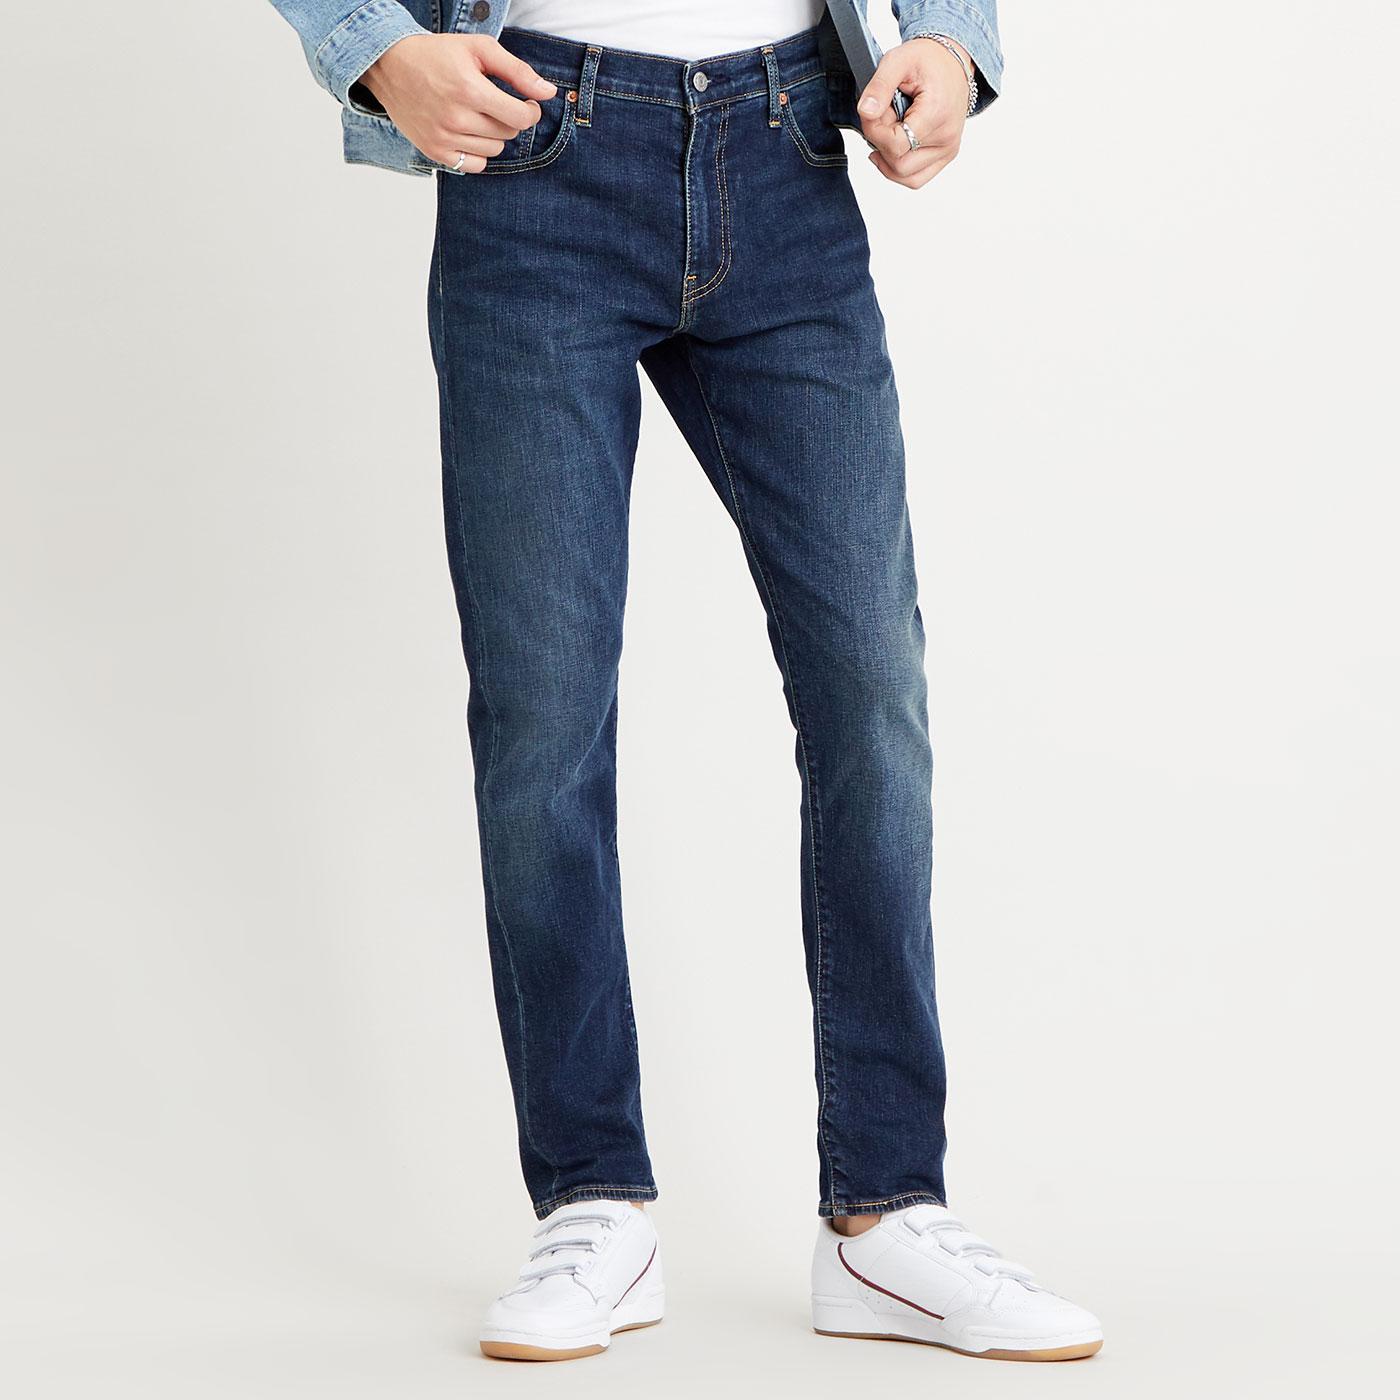 LEVI'S 512 Slim Taper Denim Jeans (Brimstone Adv)